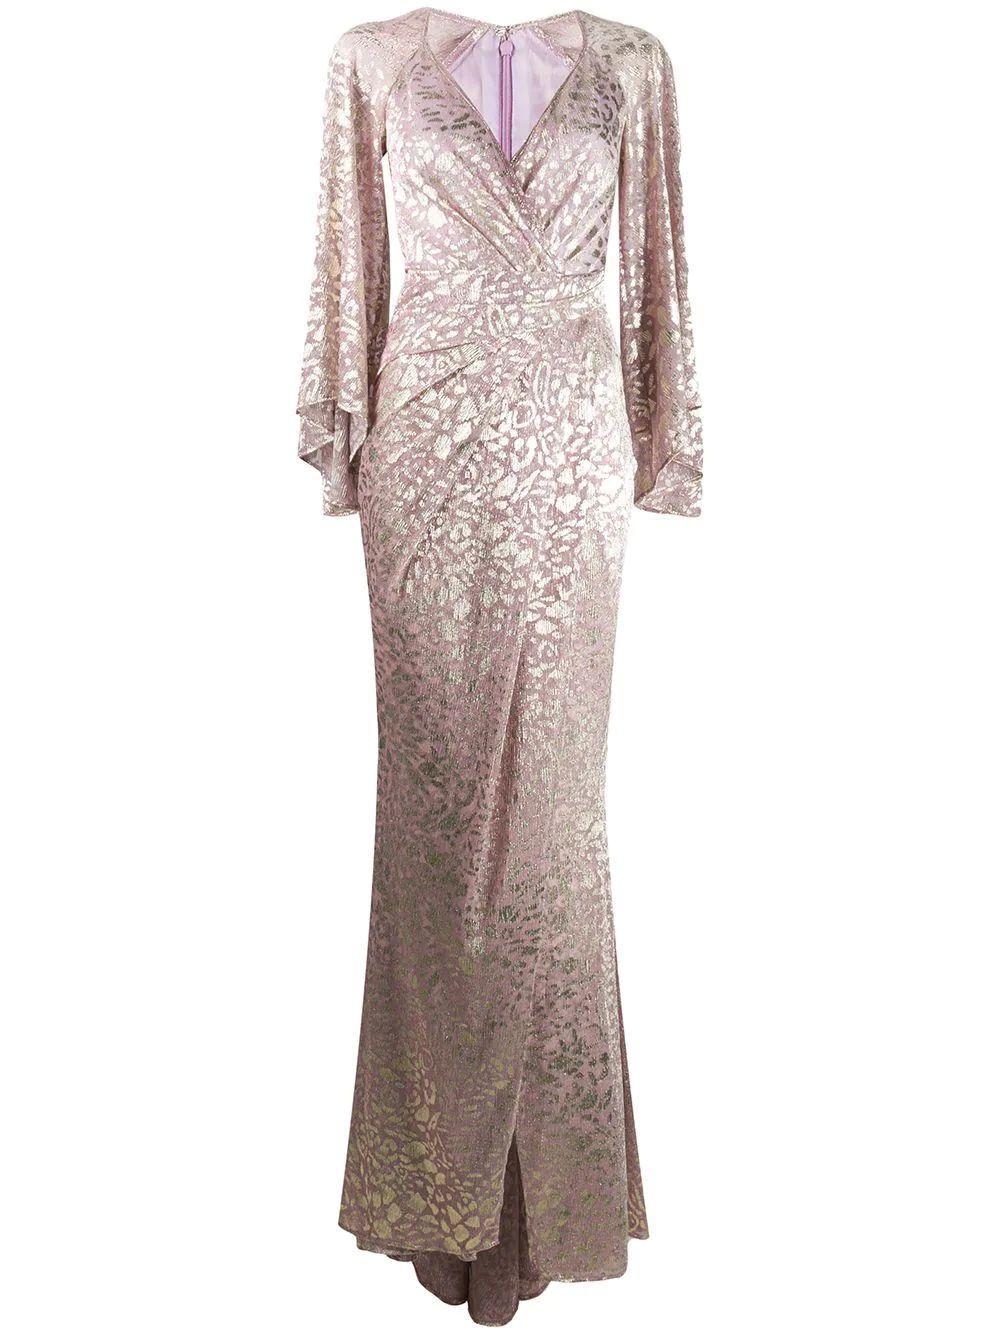 Bologne1 Gown Item # BOLOGNE1